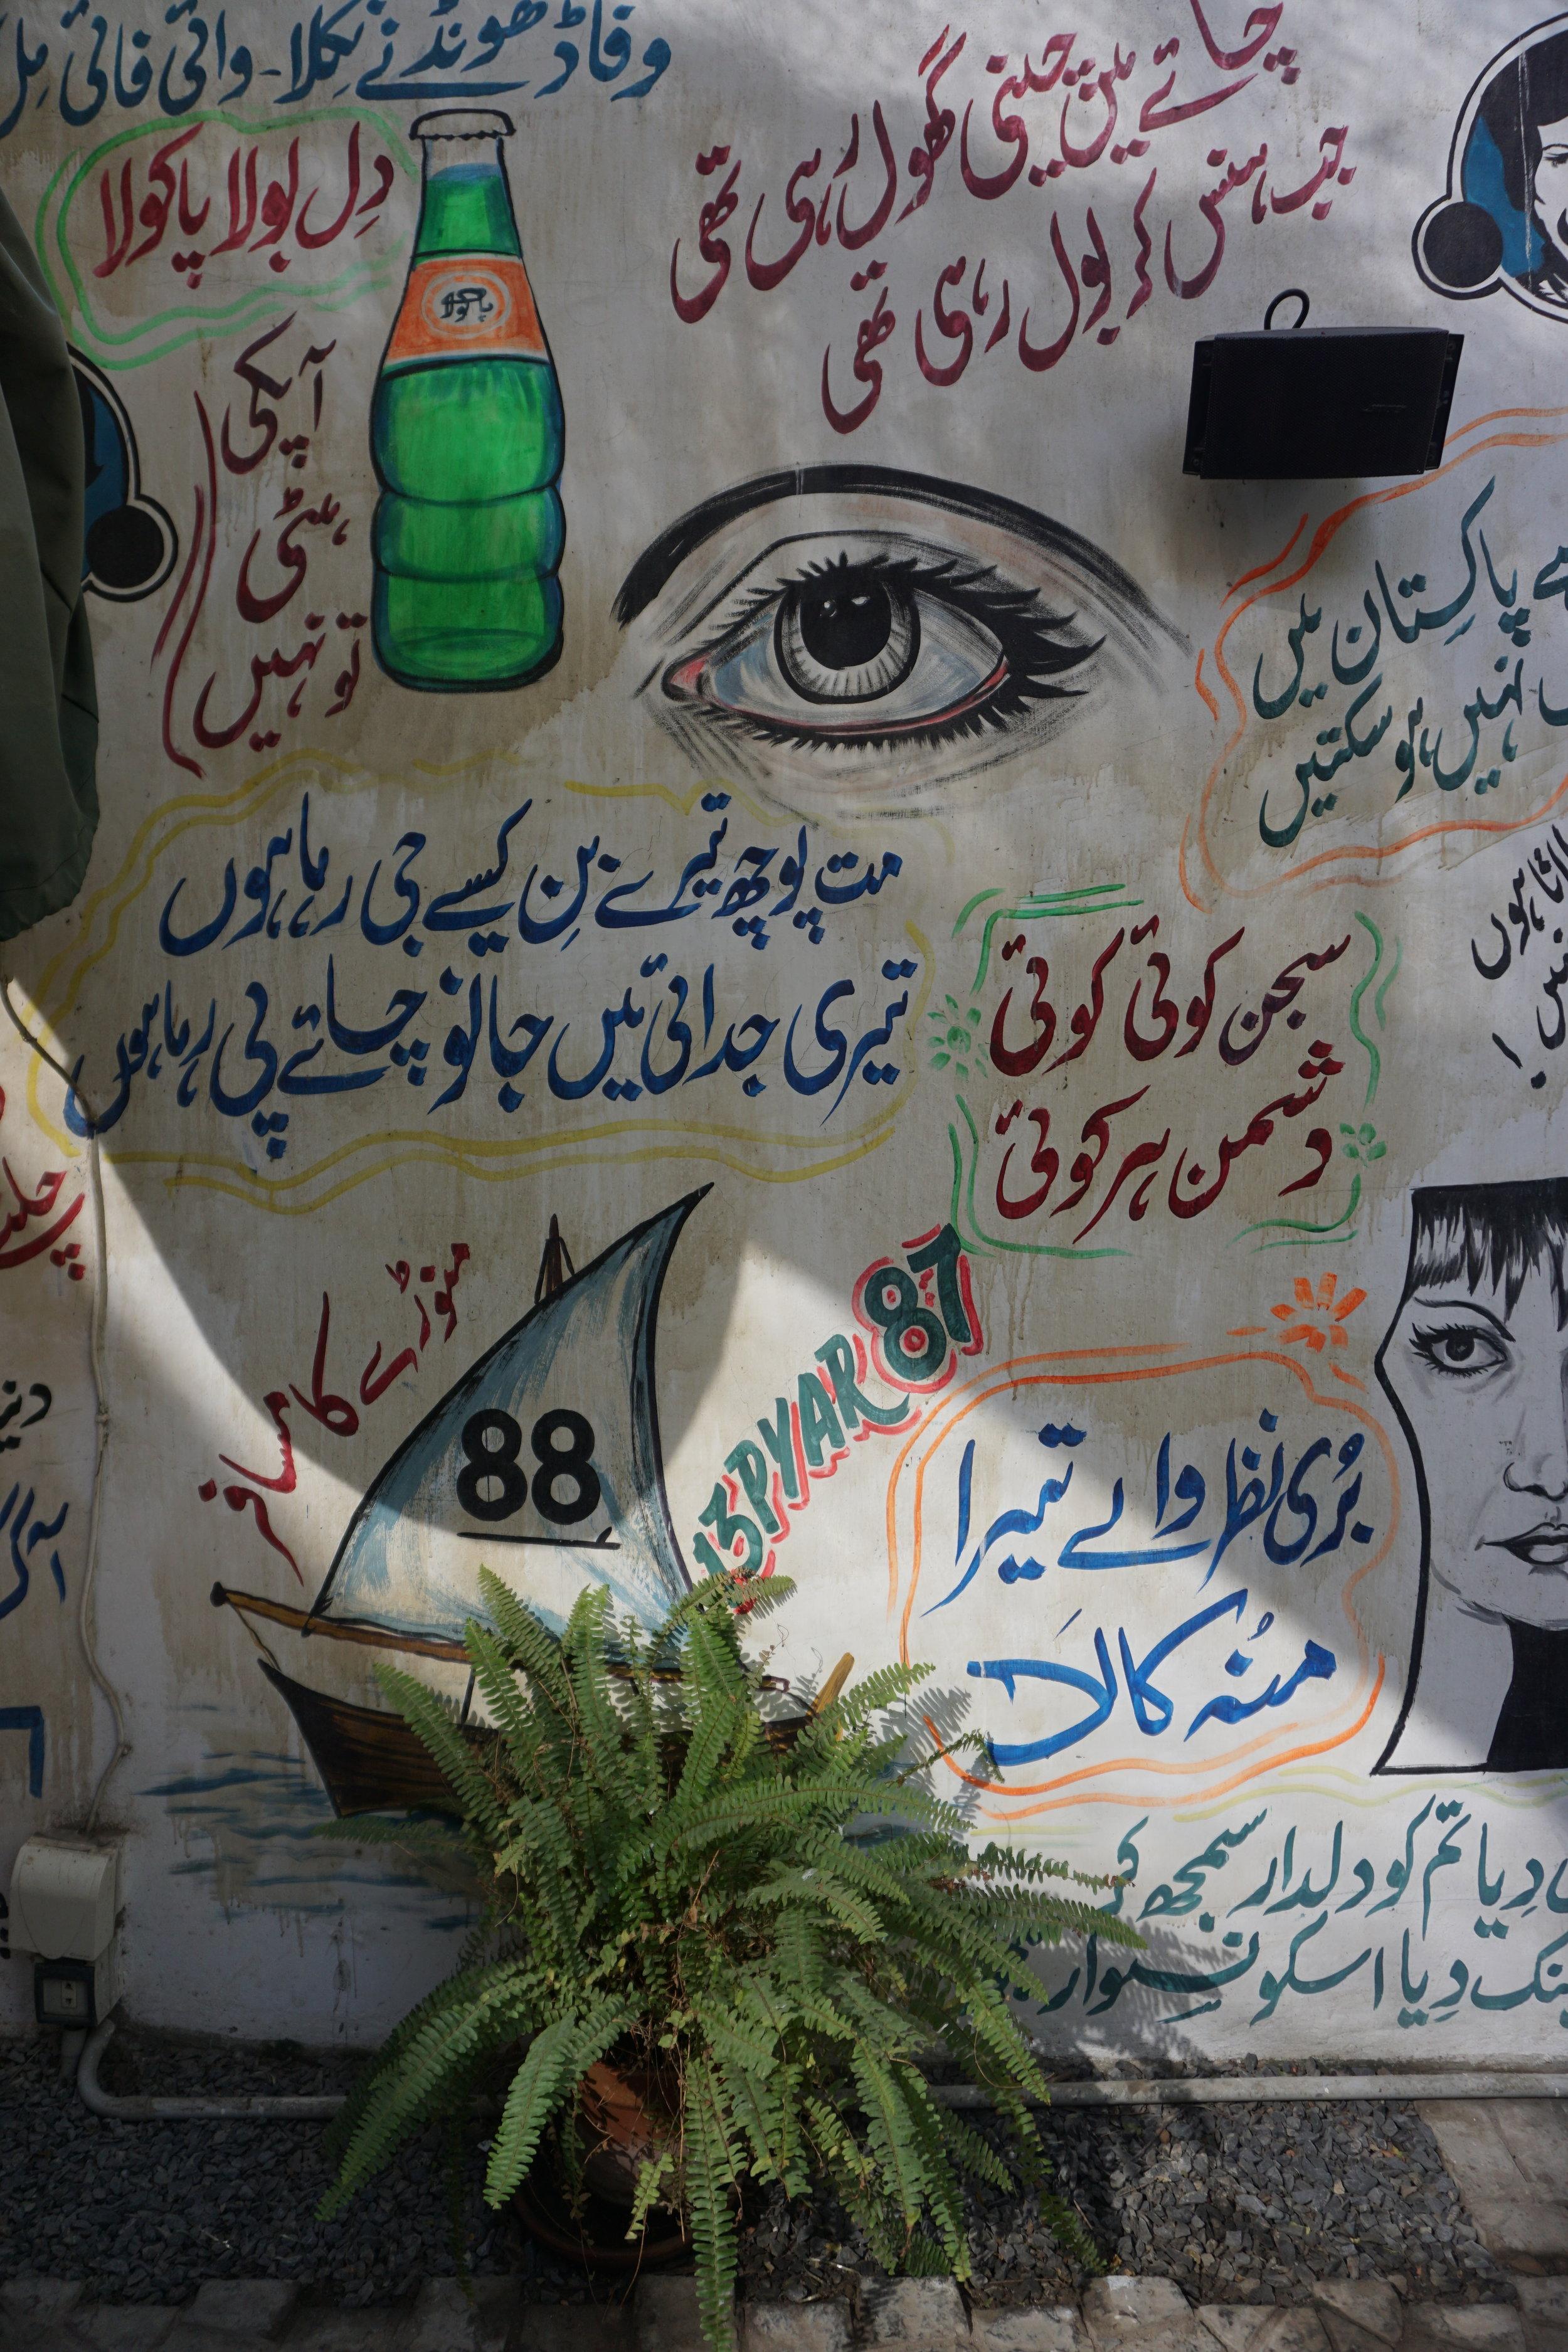 Sattar Buksh Cafe, Karachi, Pakistan